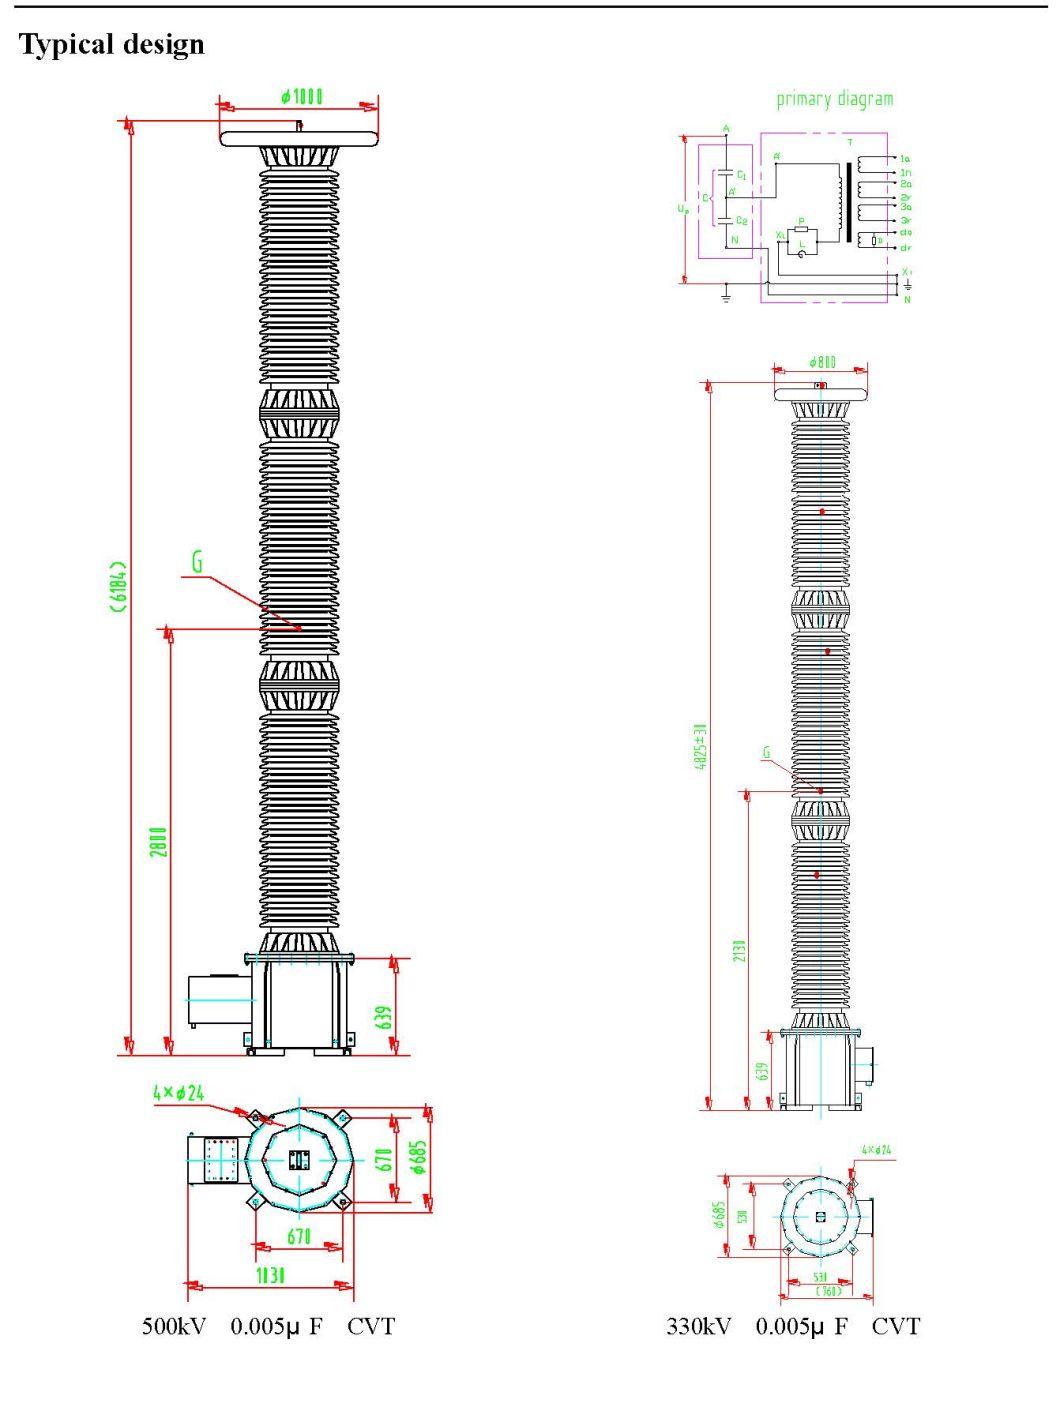 Capacitor Voltage Transformer (CVT) up to 500kv